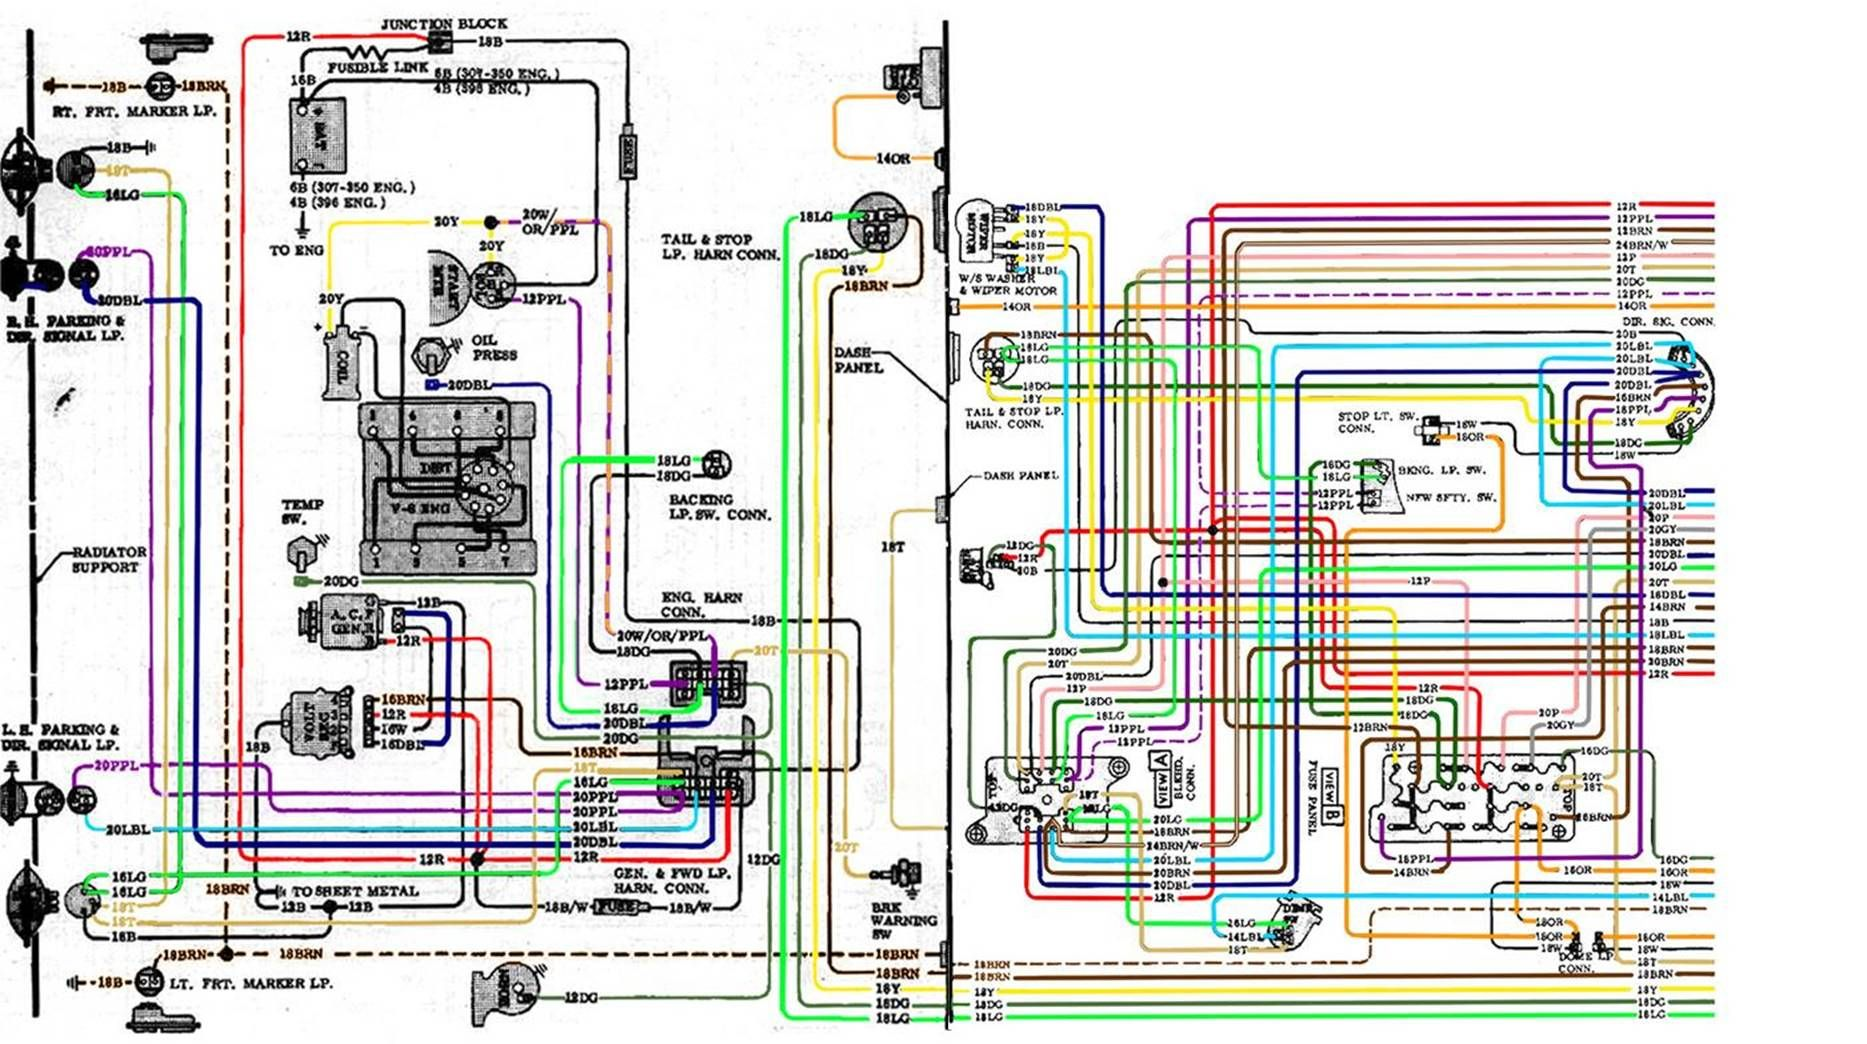 hight resolution of vega wiring diagram lights everything wiring diagram 1972 chevy nova wiring diagram 72 chevy wiring diagram